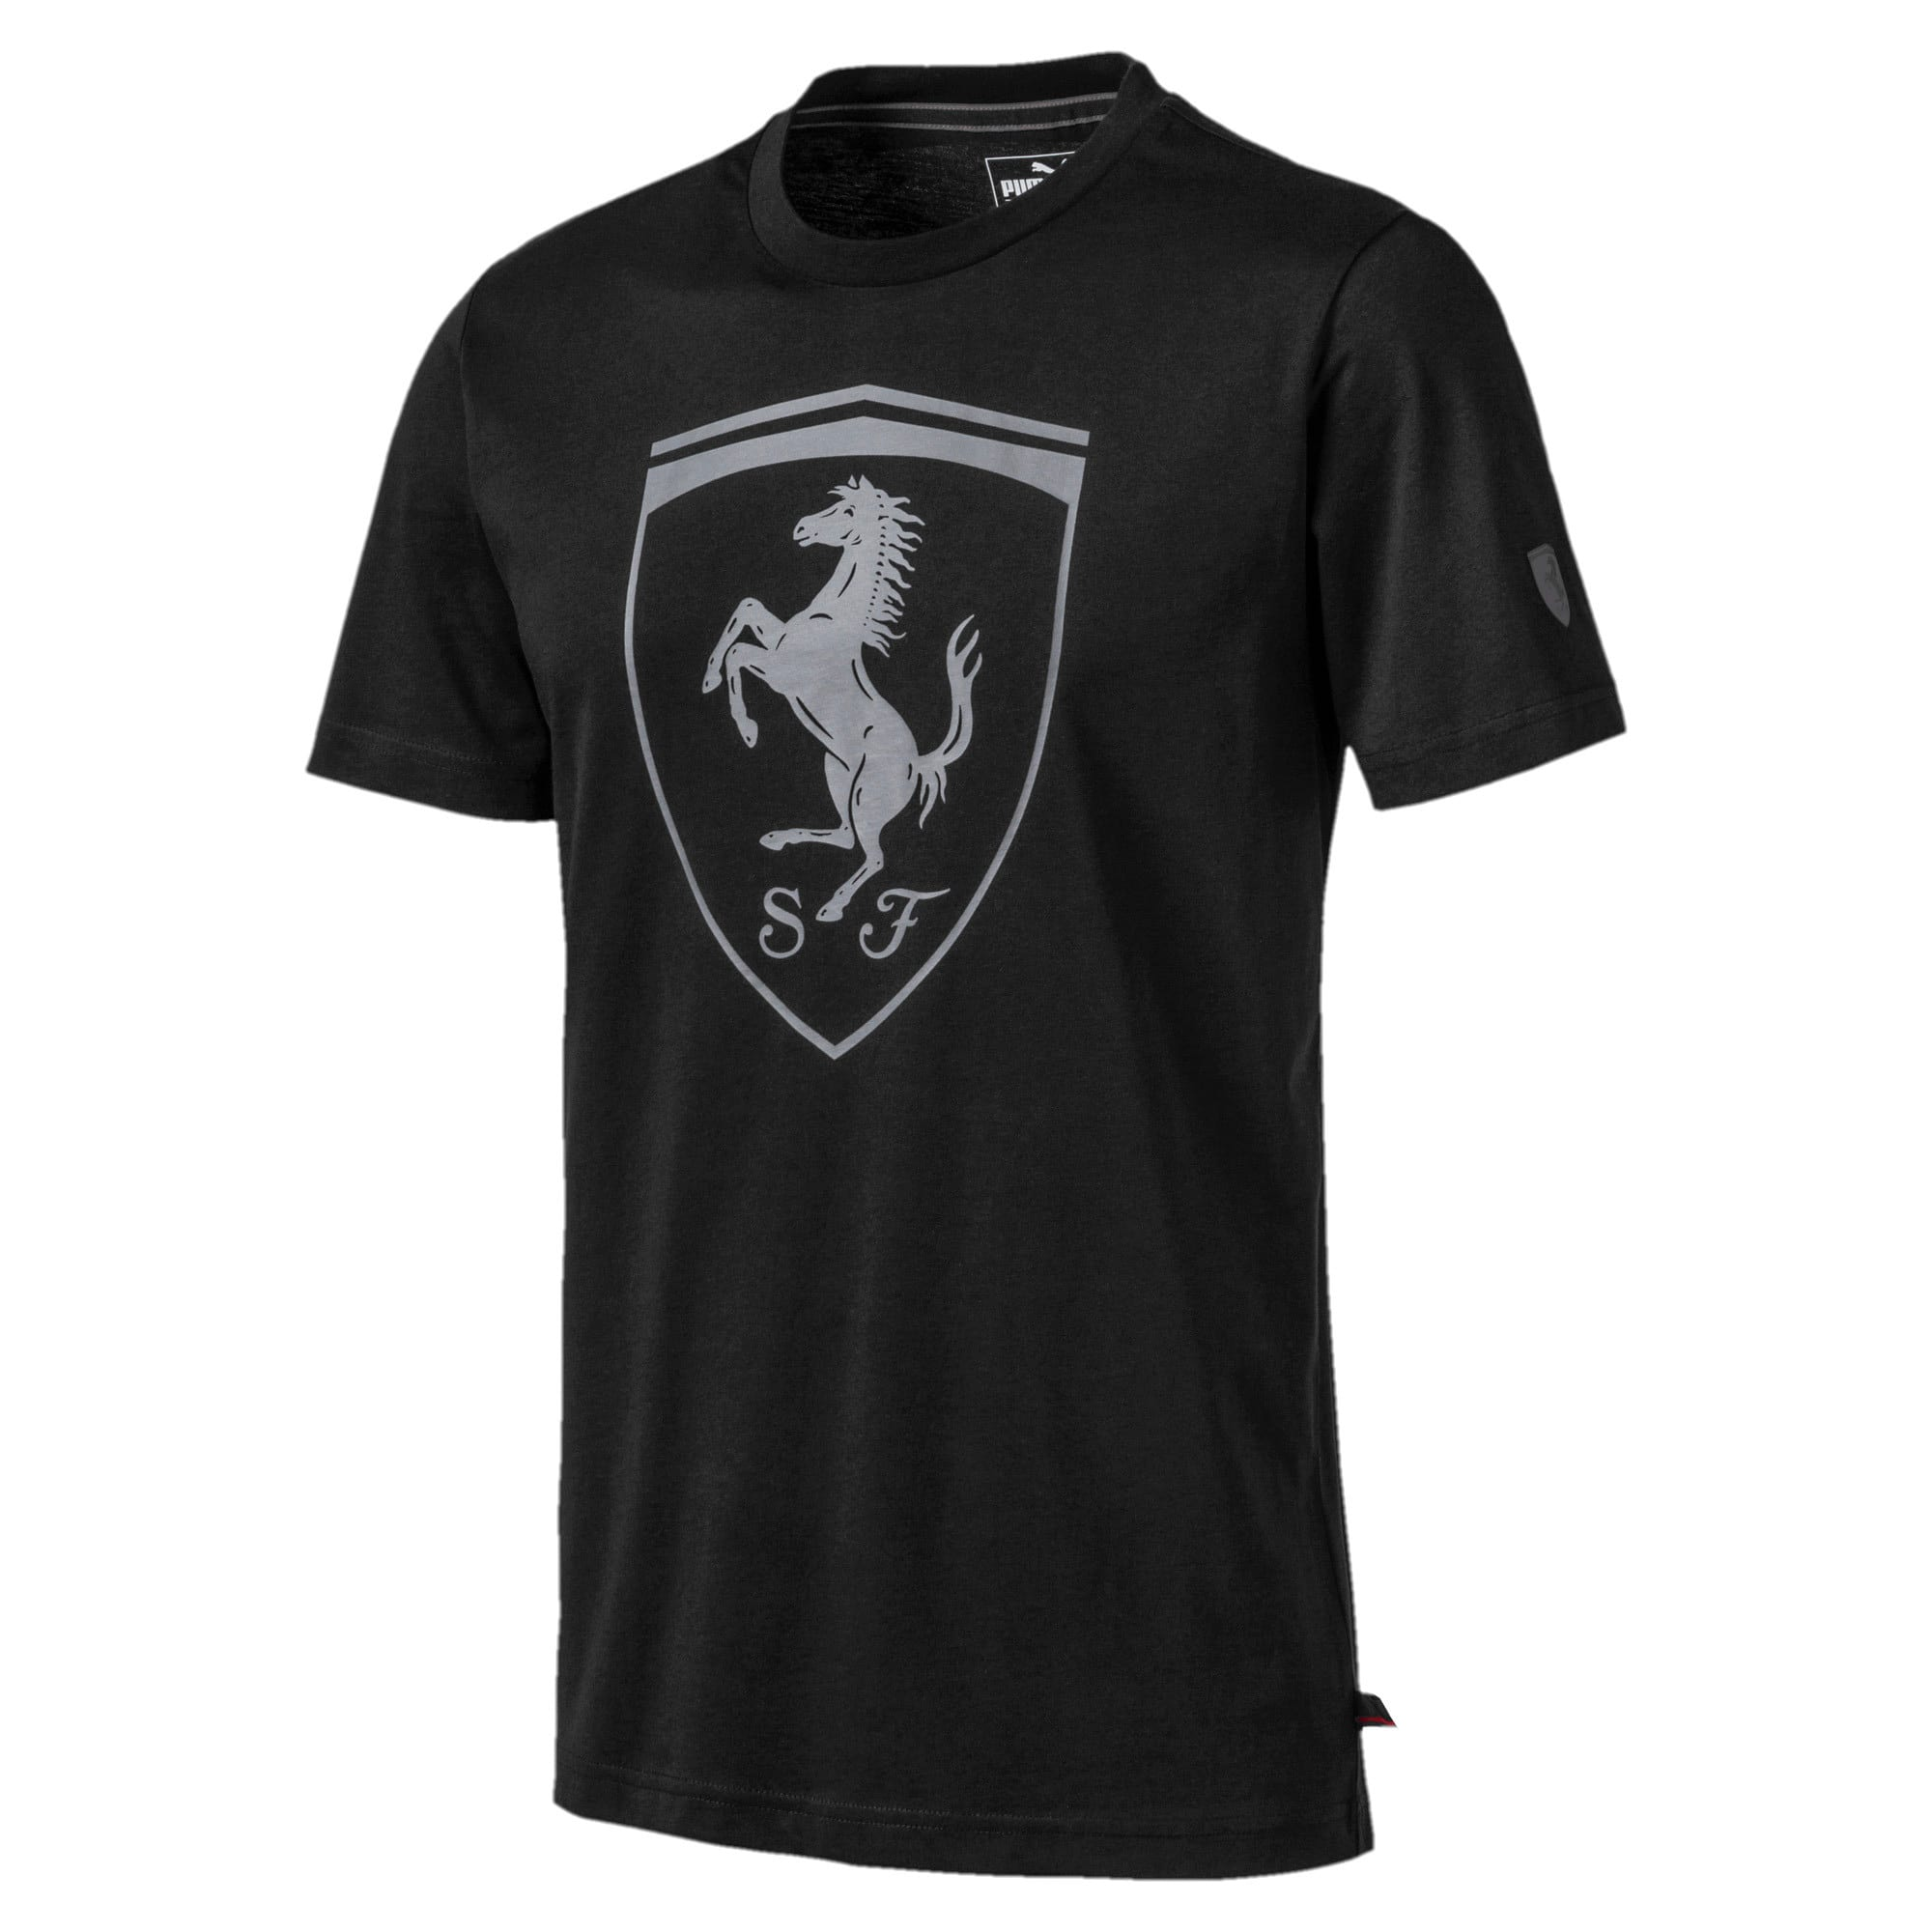 Thumbnail 5 of Ferrari Big Shield T-shirt voor heren, Puma Black, medium